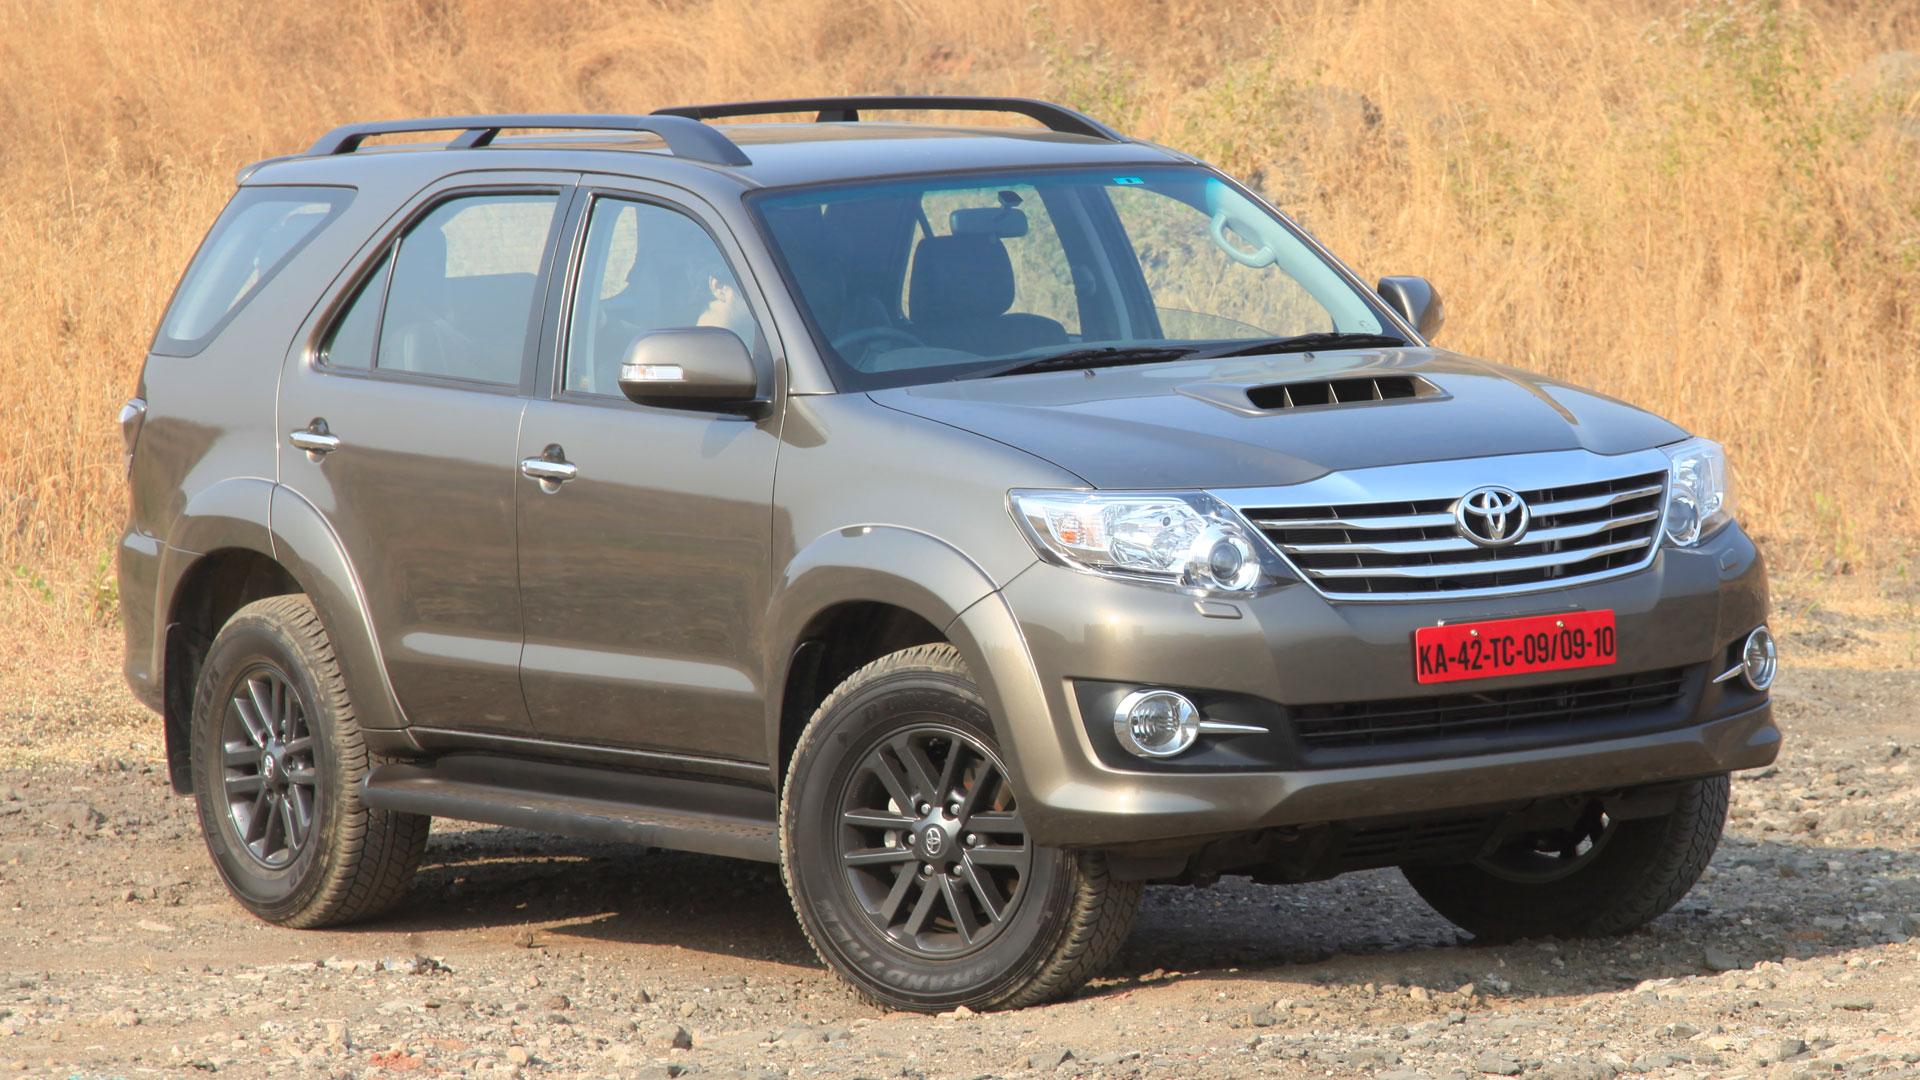 Toyota-fortuner-2015 Exterior Car Photos - Overdrive